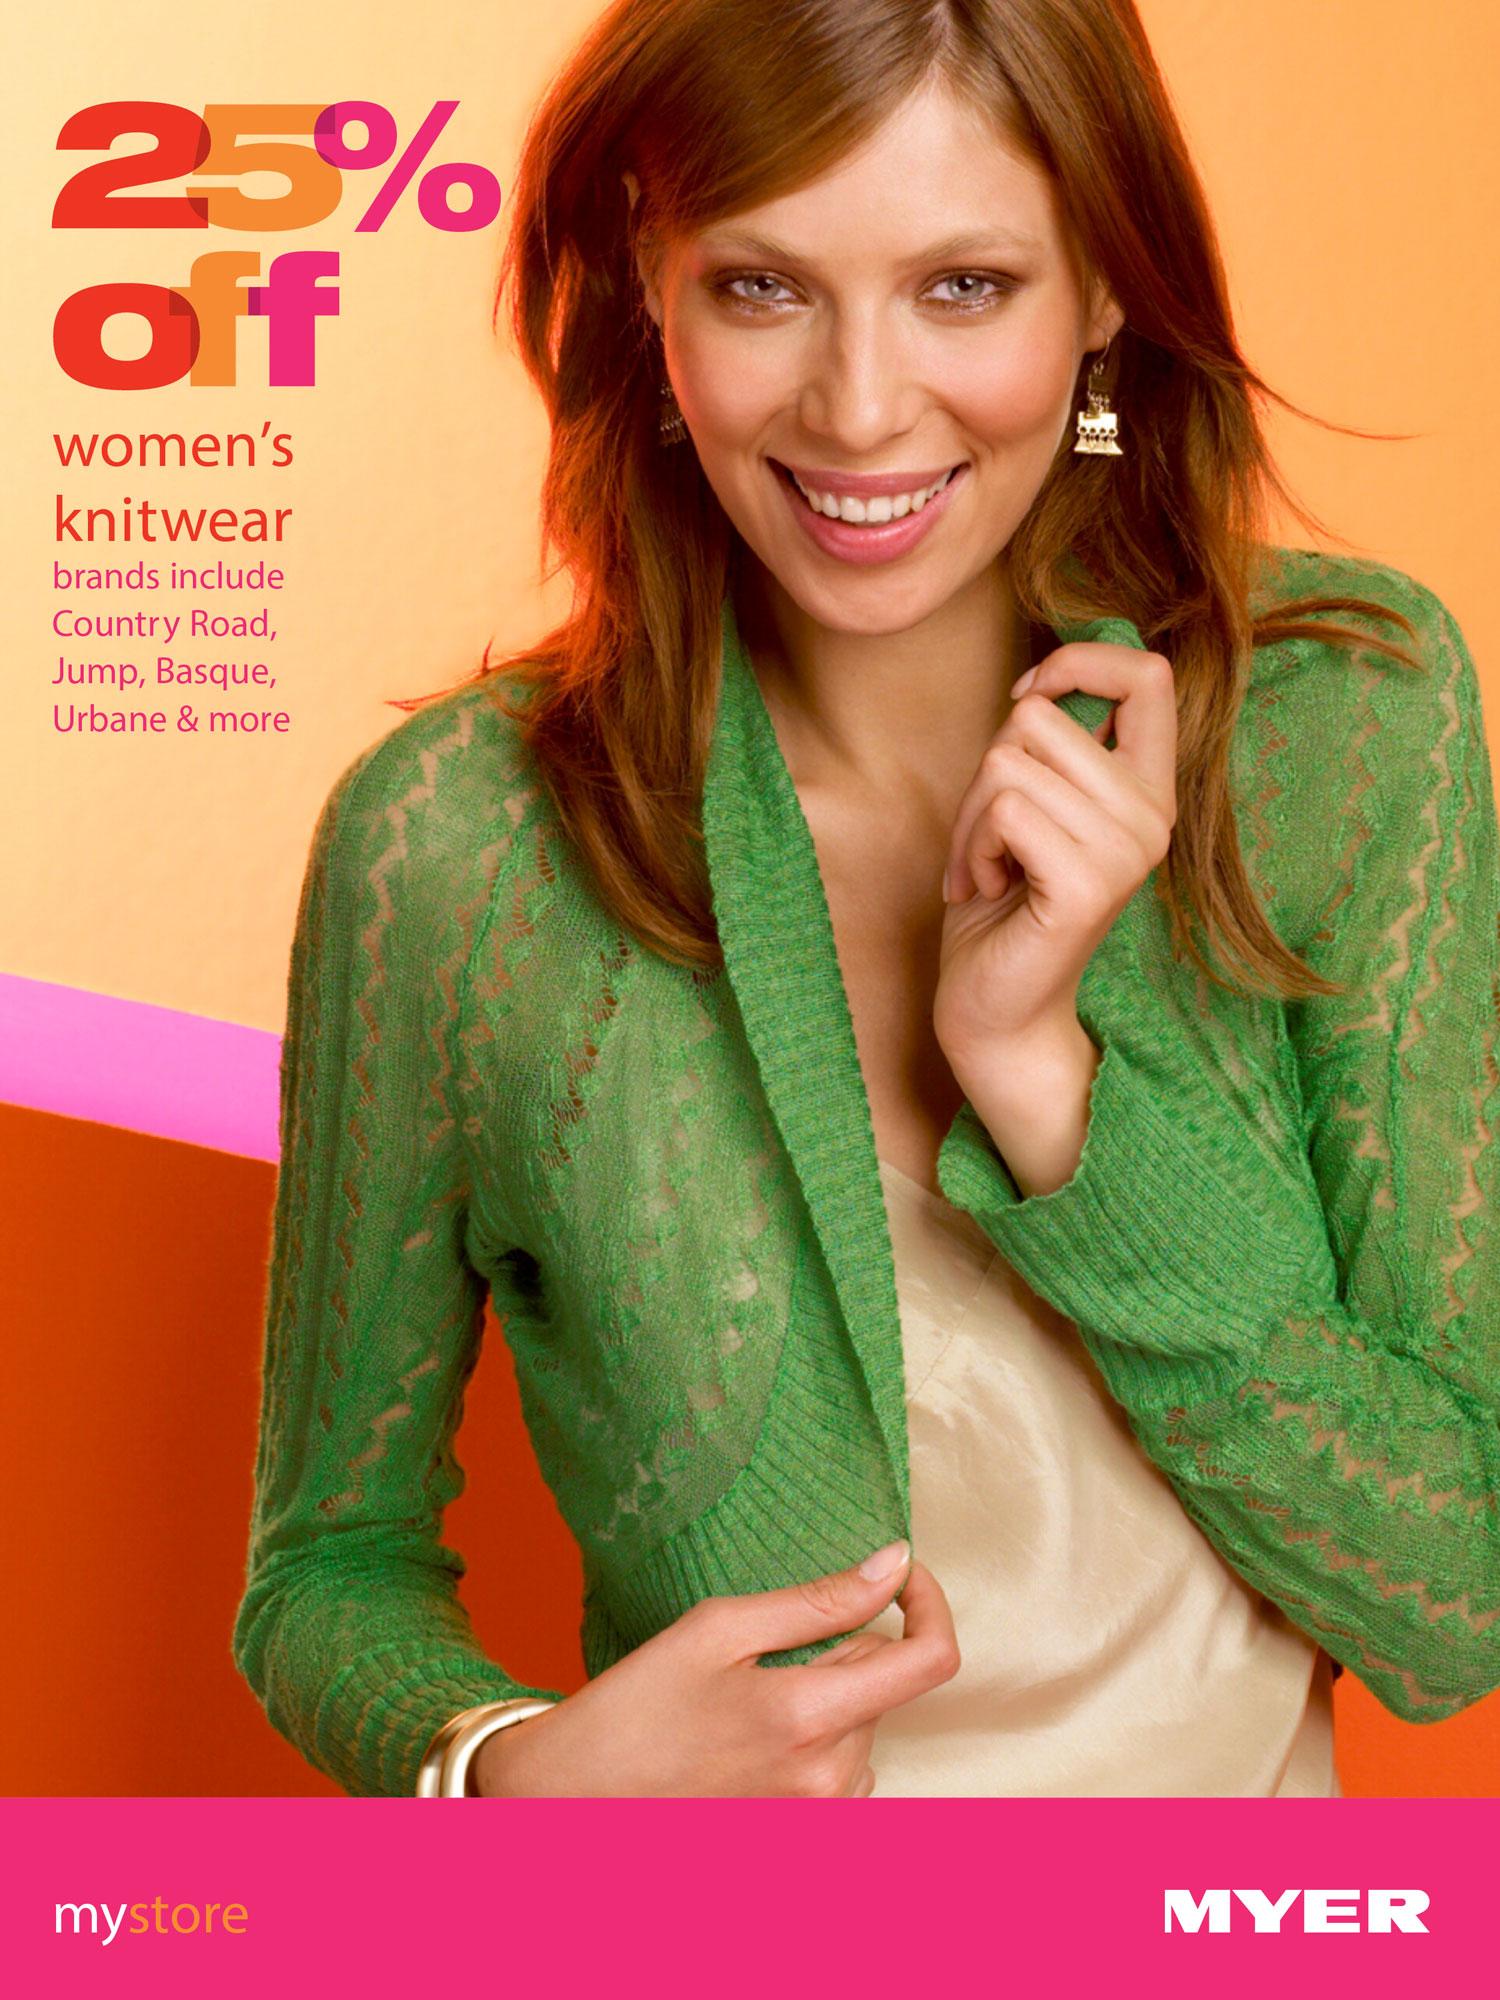 fashion-hotsalepage.jpg